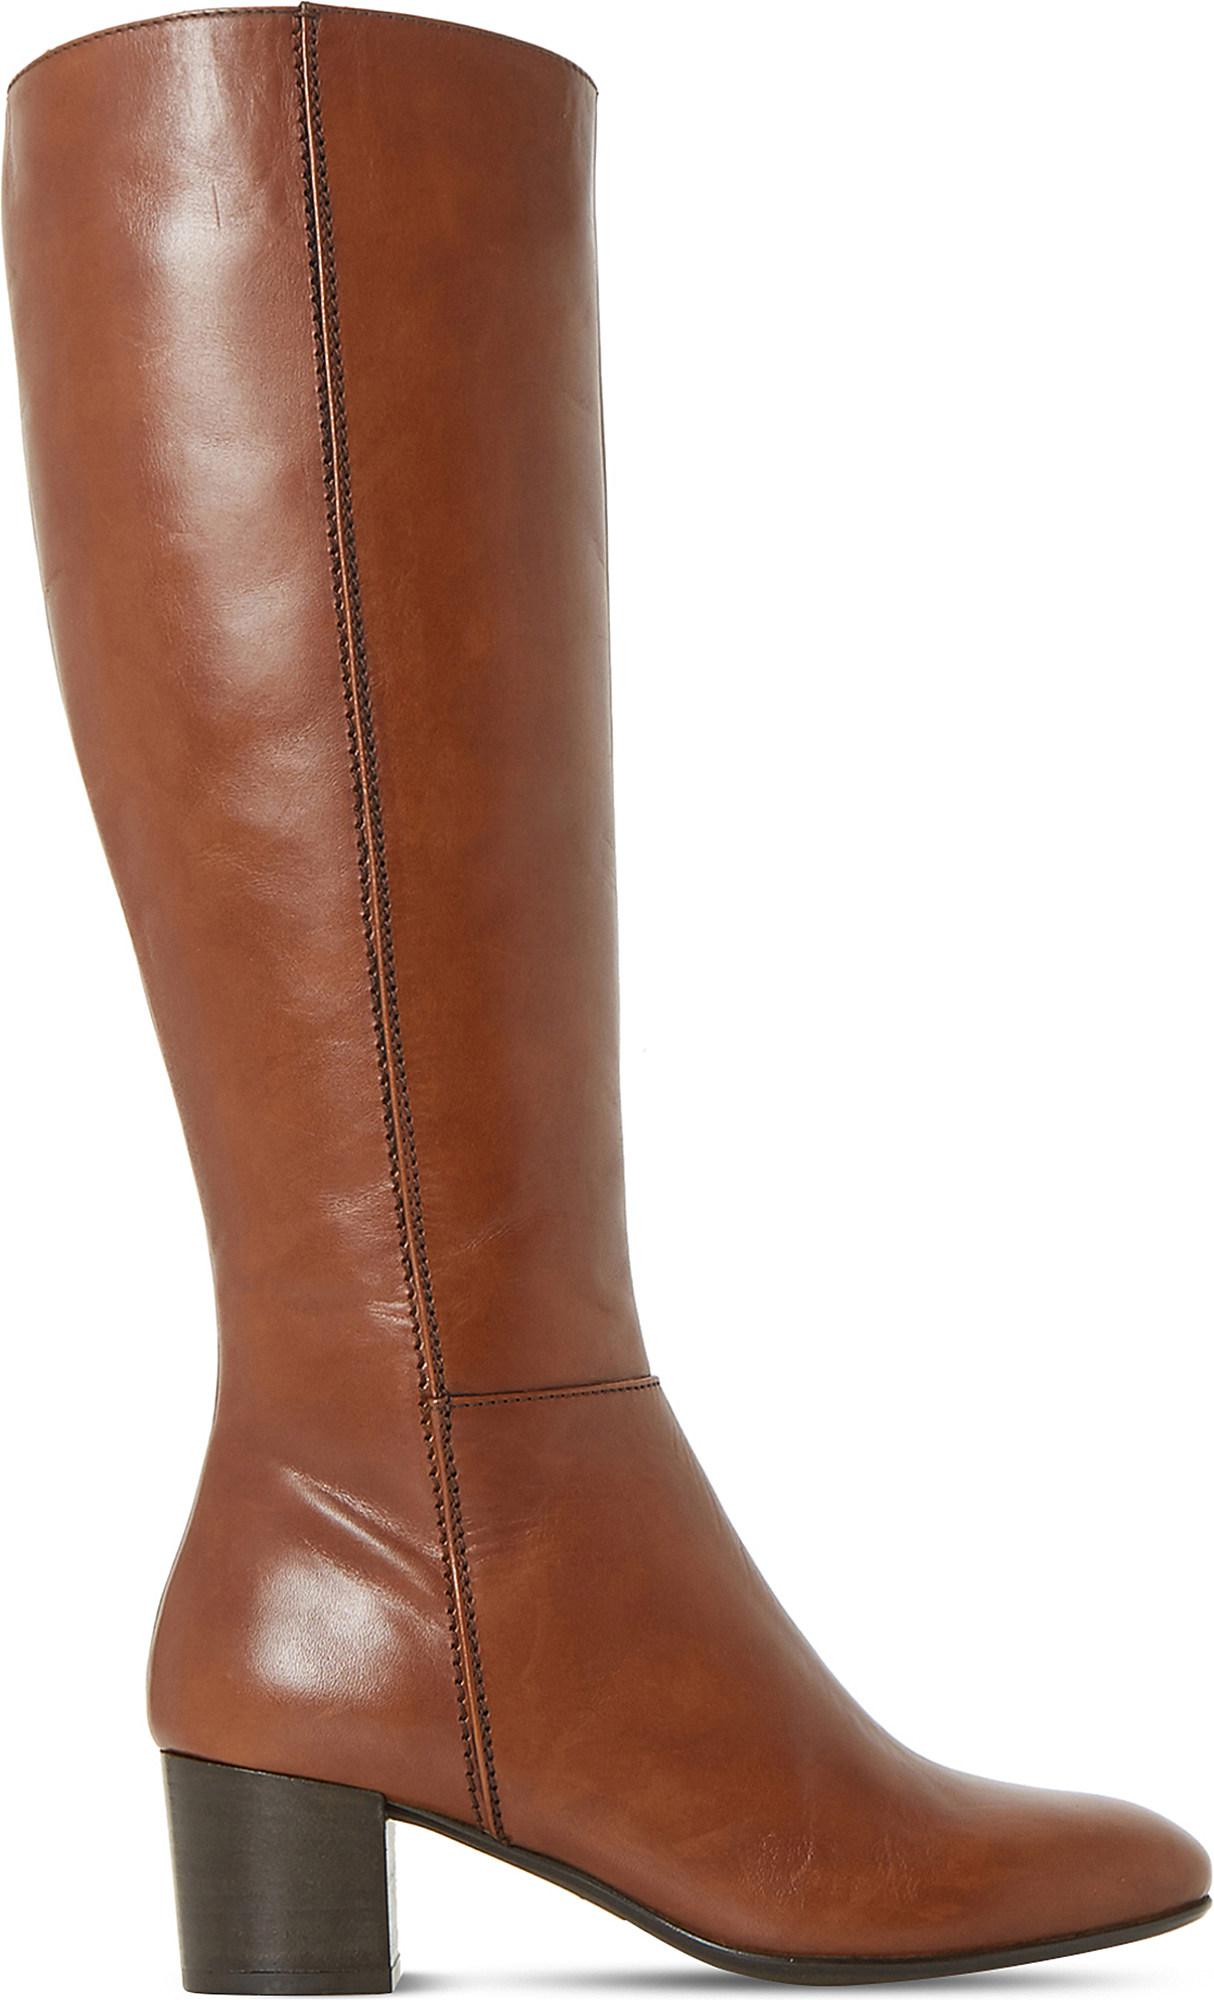 63538b2523b Dune Ladies Tan Classic Tarak Leather Boots in Brown - Lyst